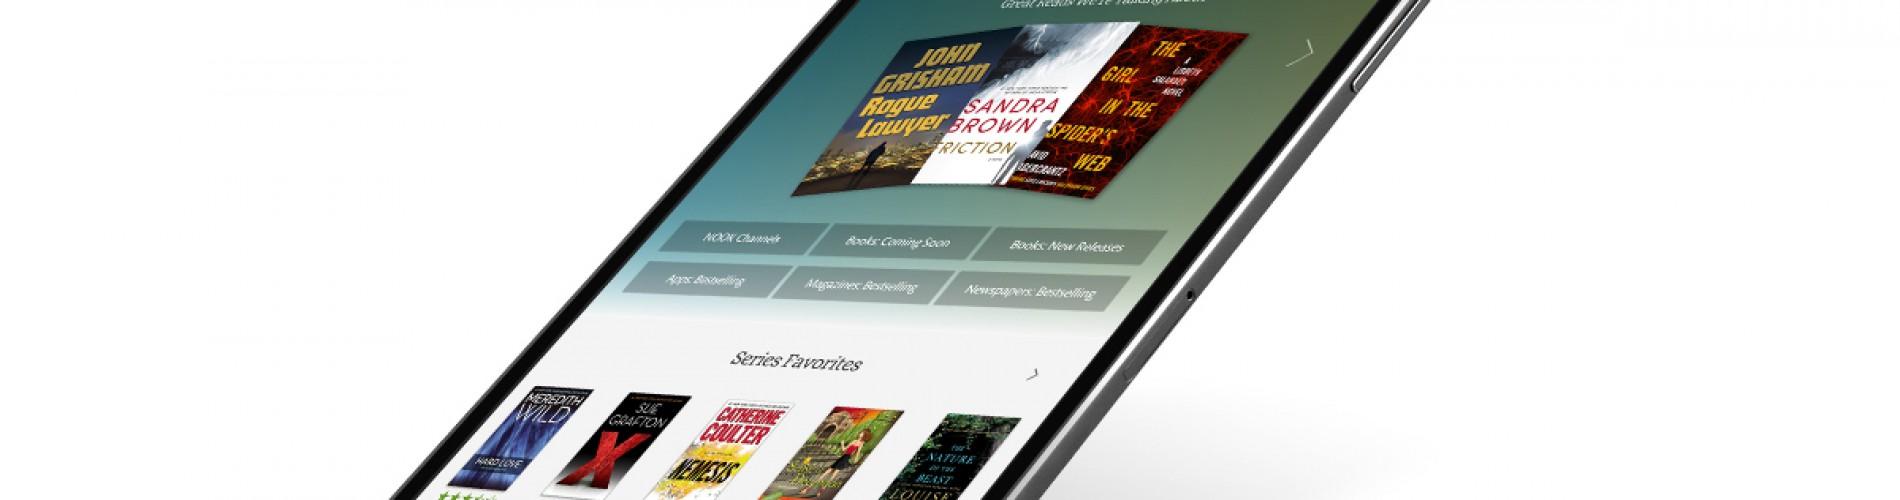 Barnes & Noble, Samsung announce Galaxy Tab S2 Nook